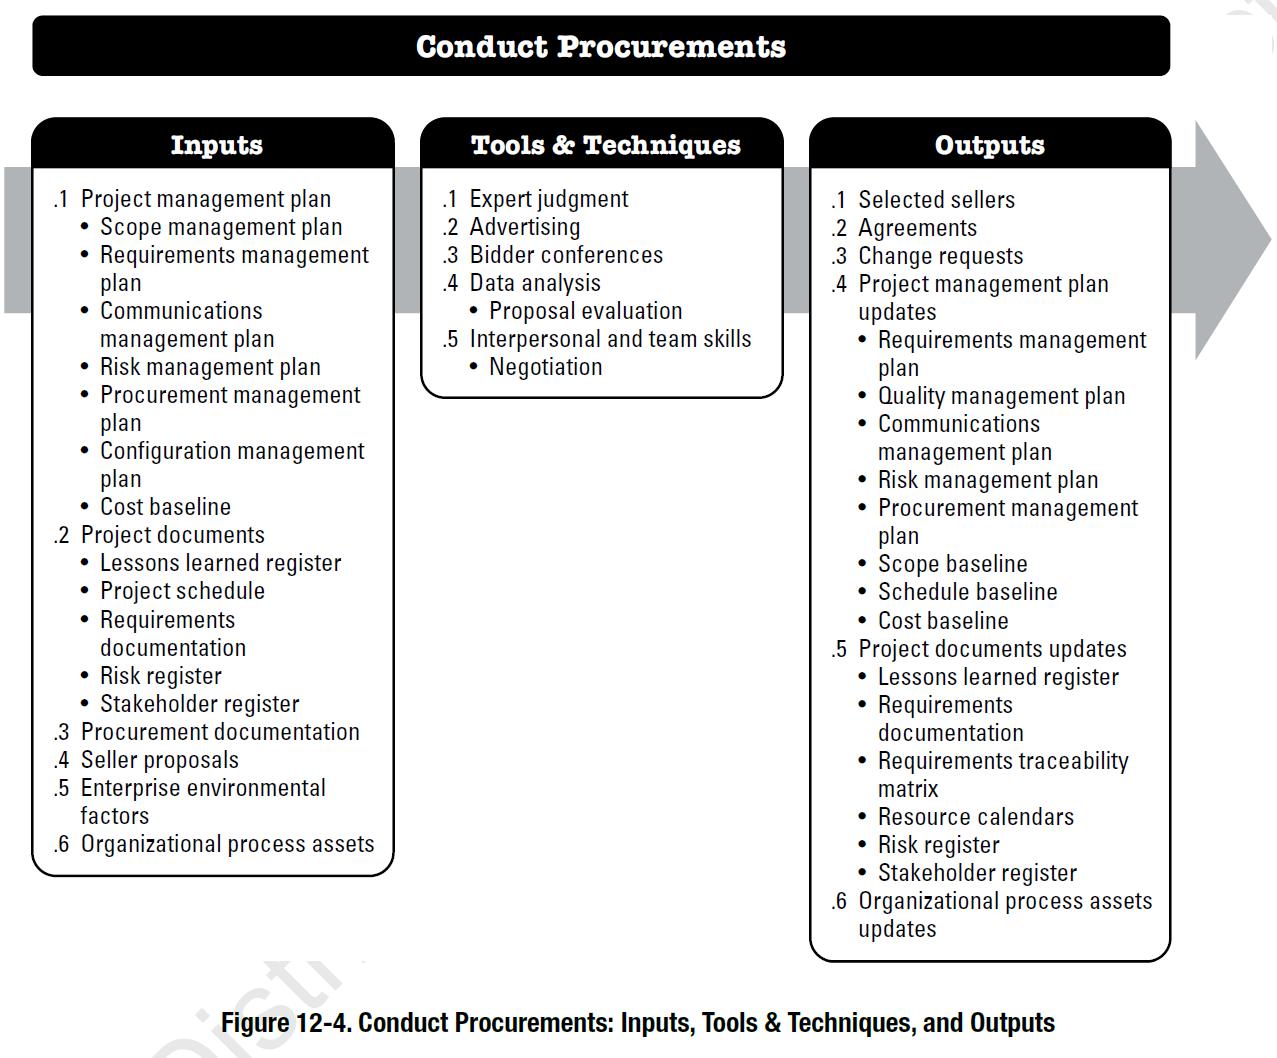 Project Procurement Management According To The PMBOK - Project management requirements document